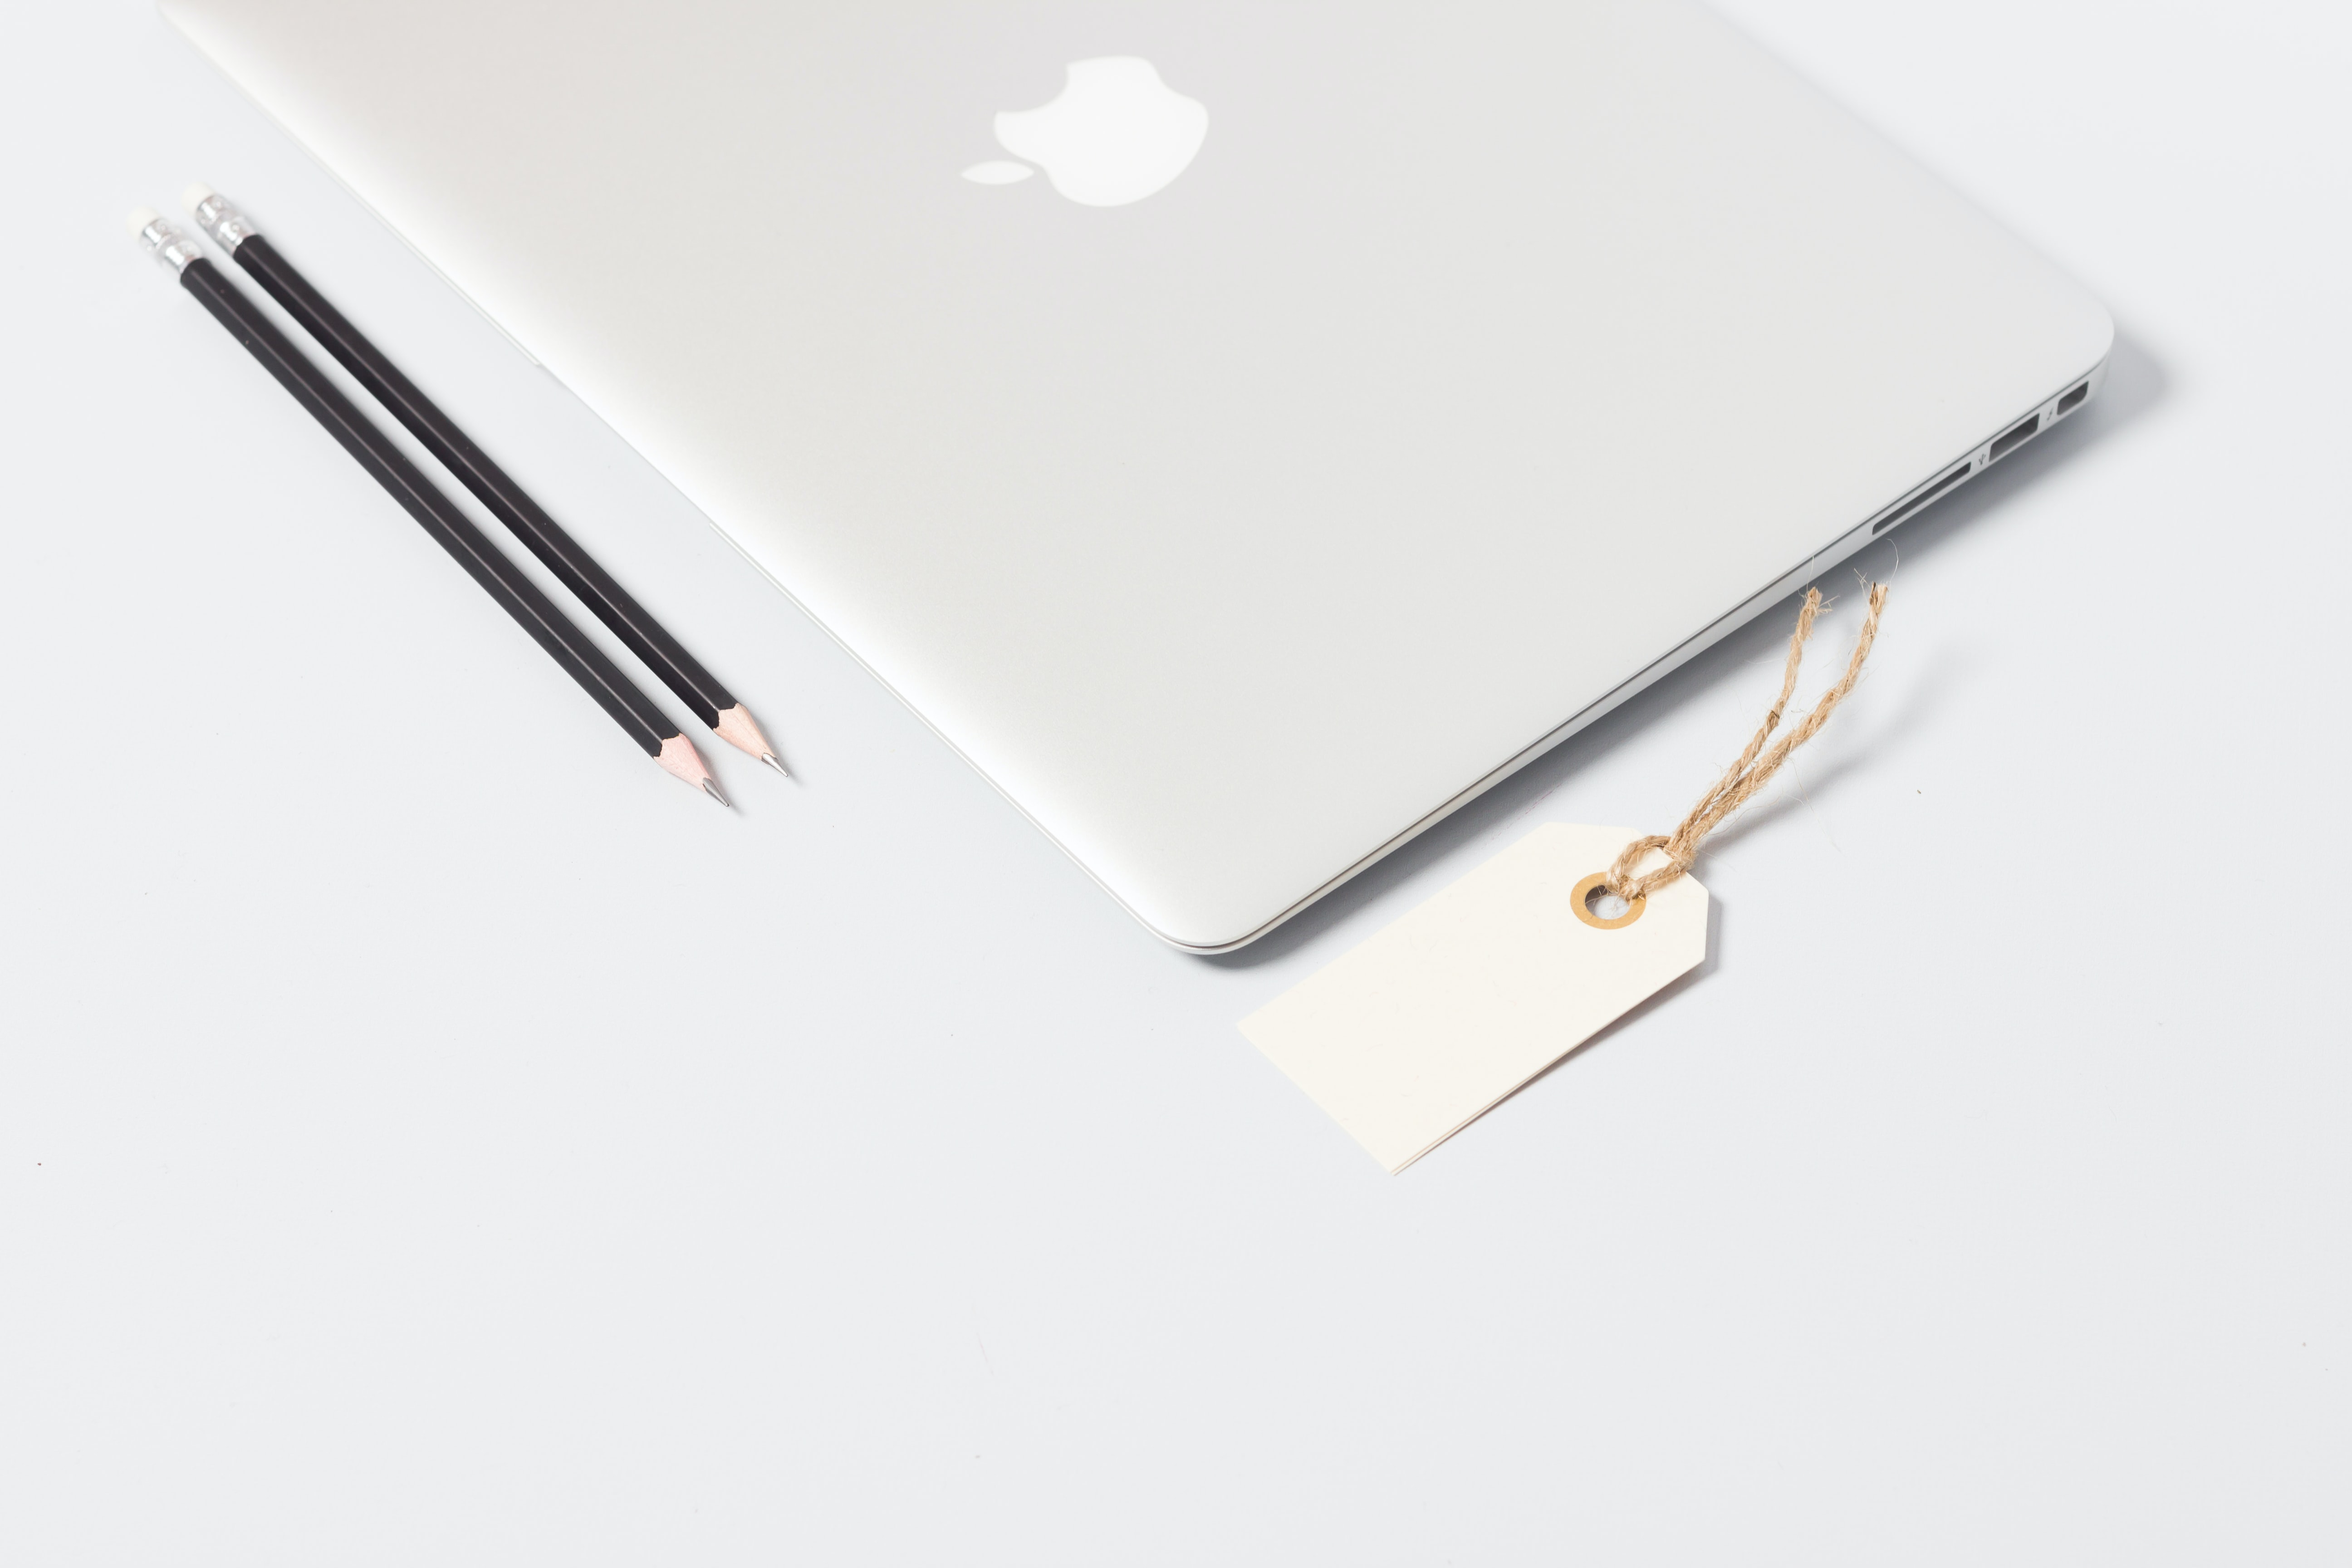 closeup photo of MacBook Air near pencils